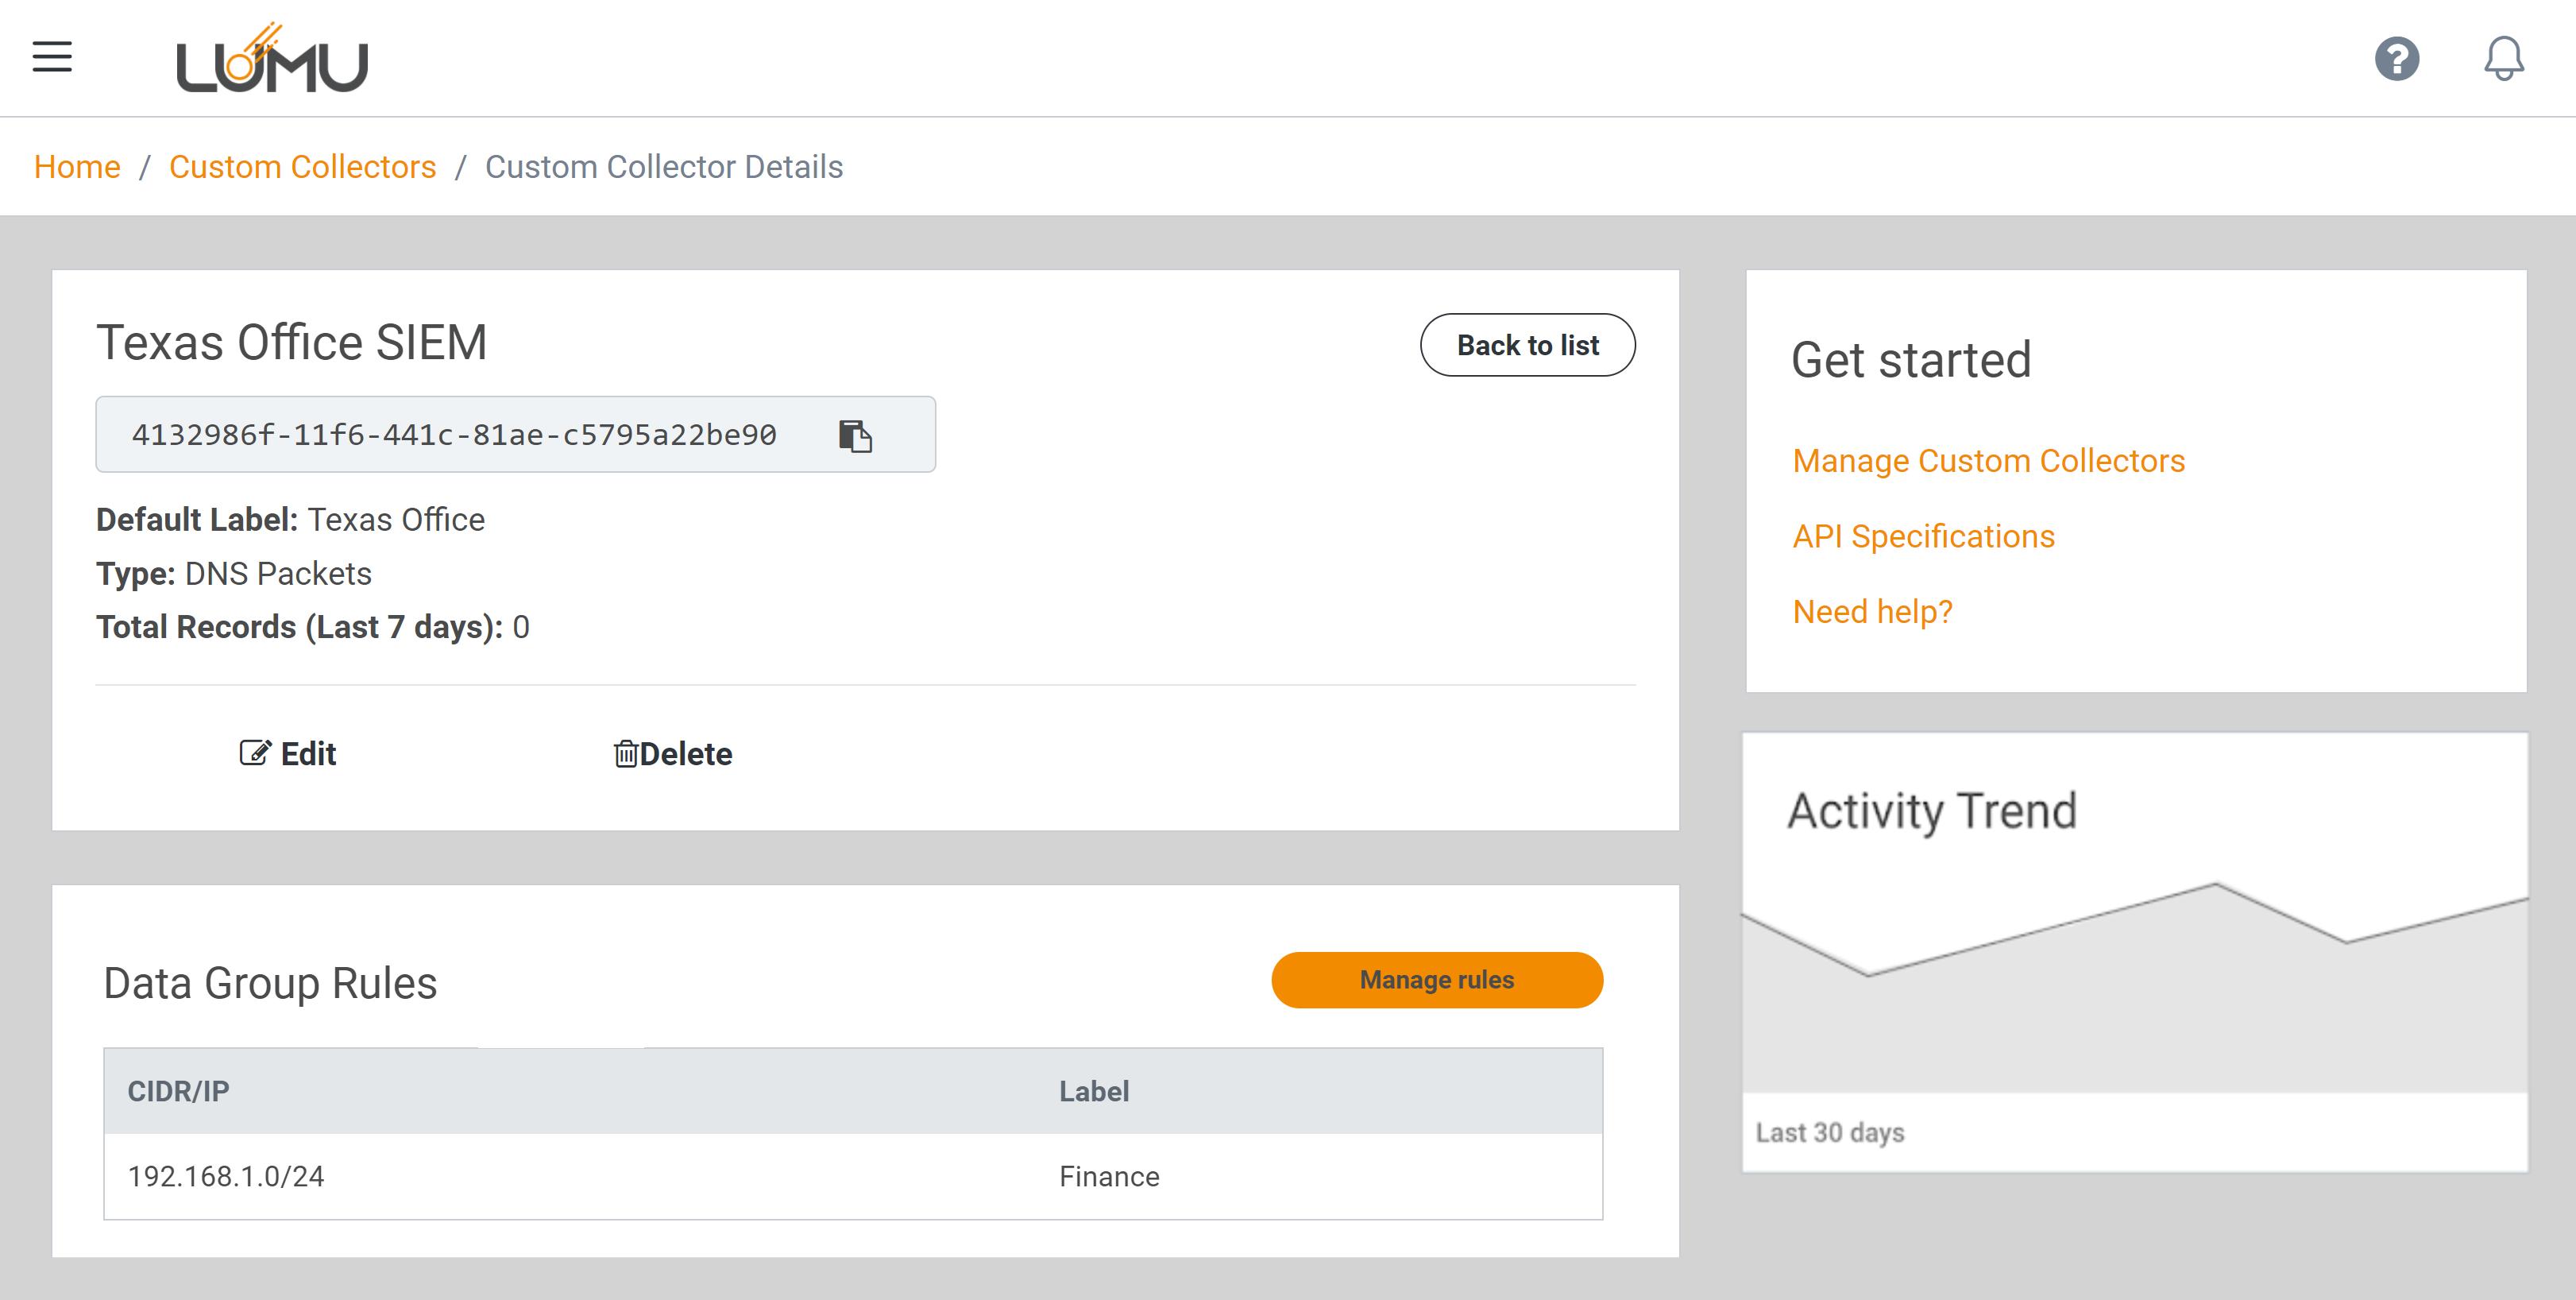 Custom Collector details screen - Lumu Portal